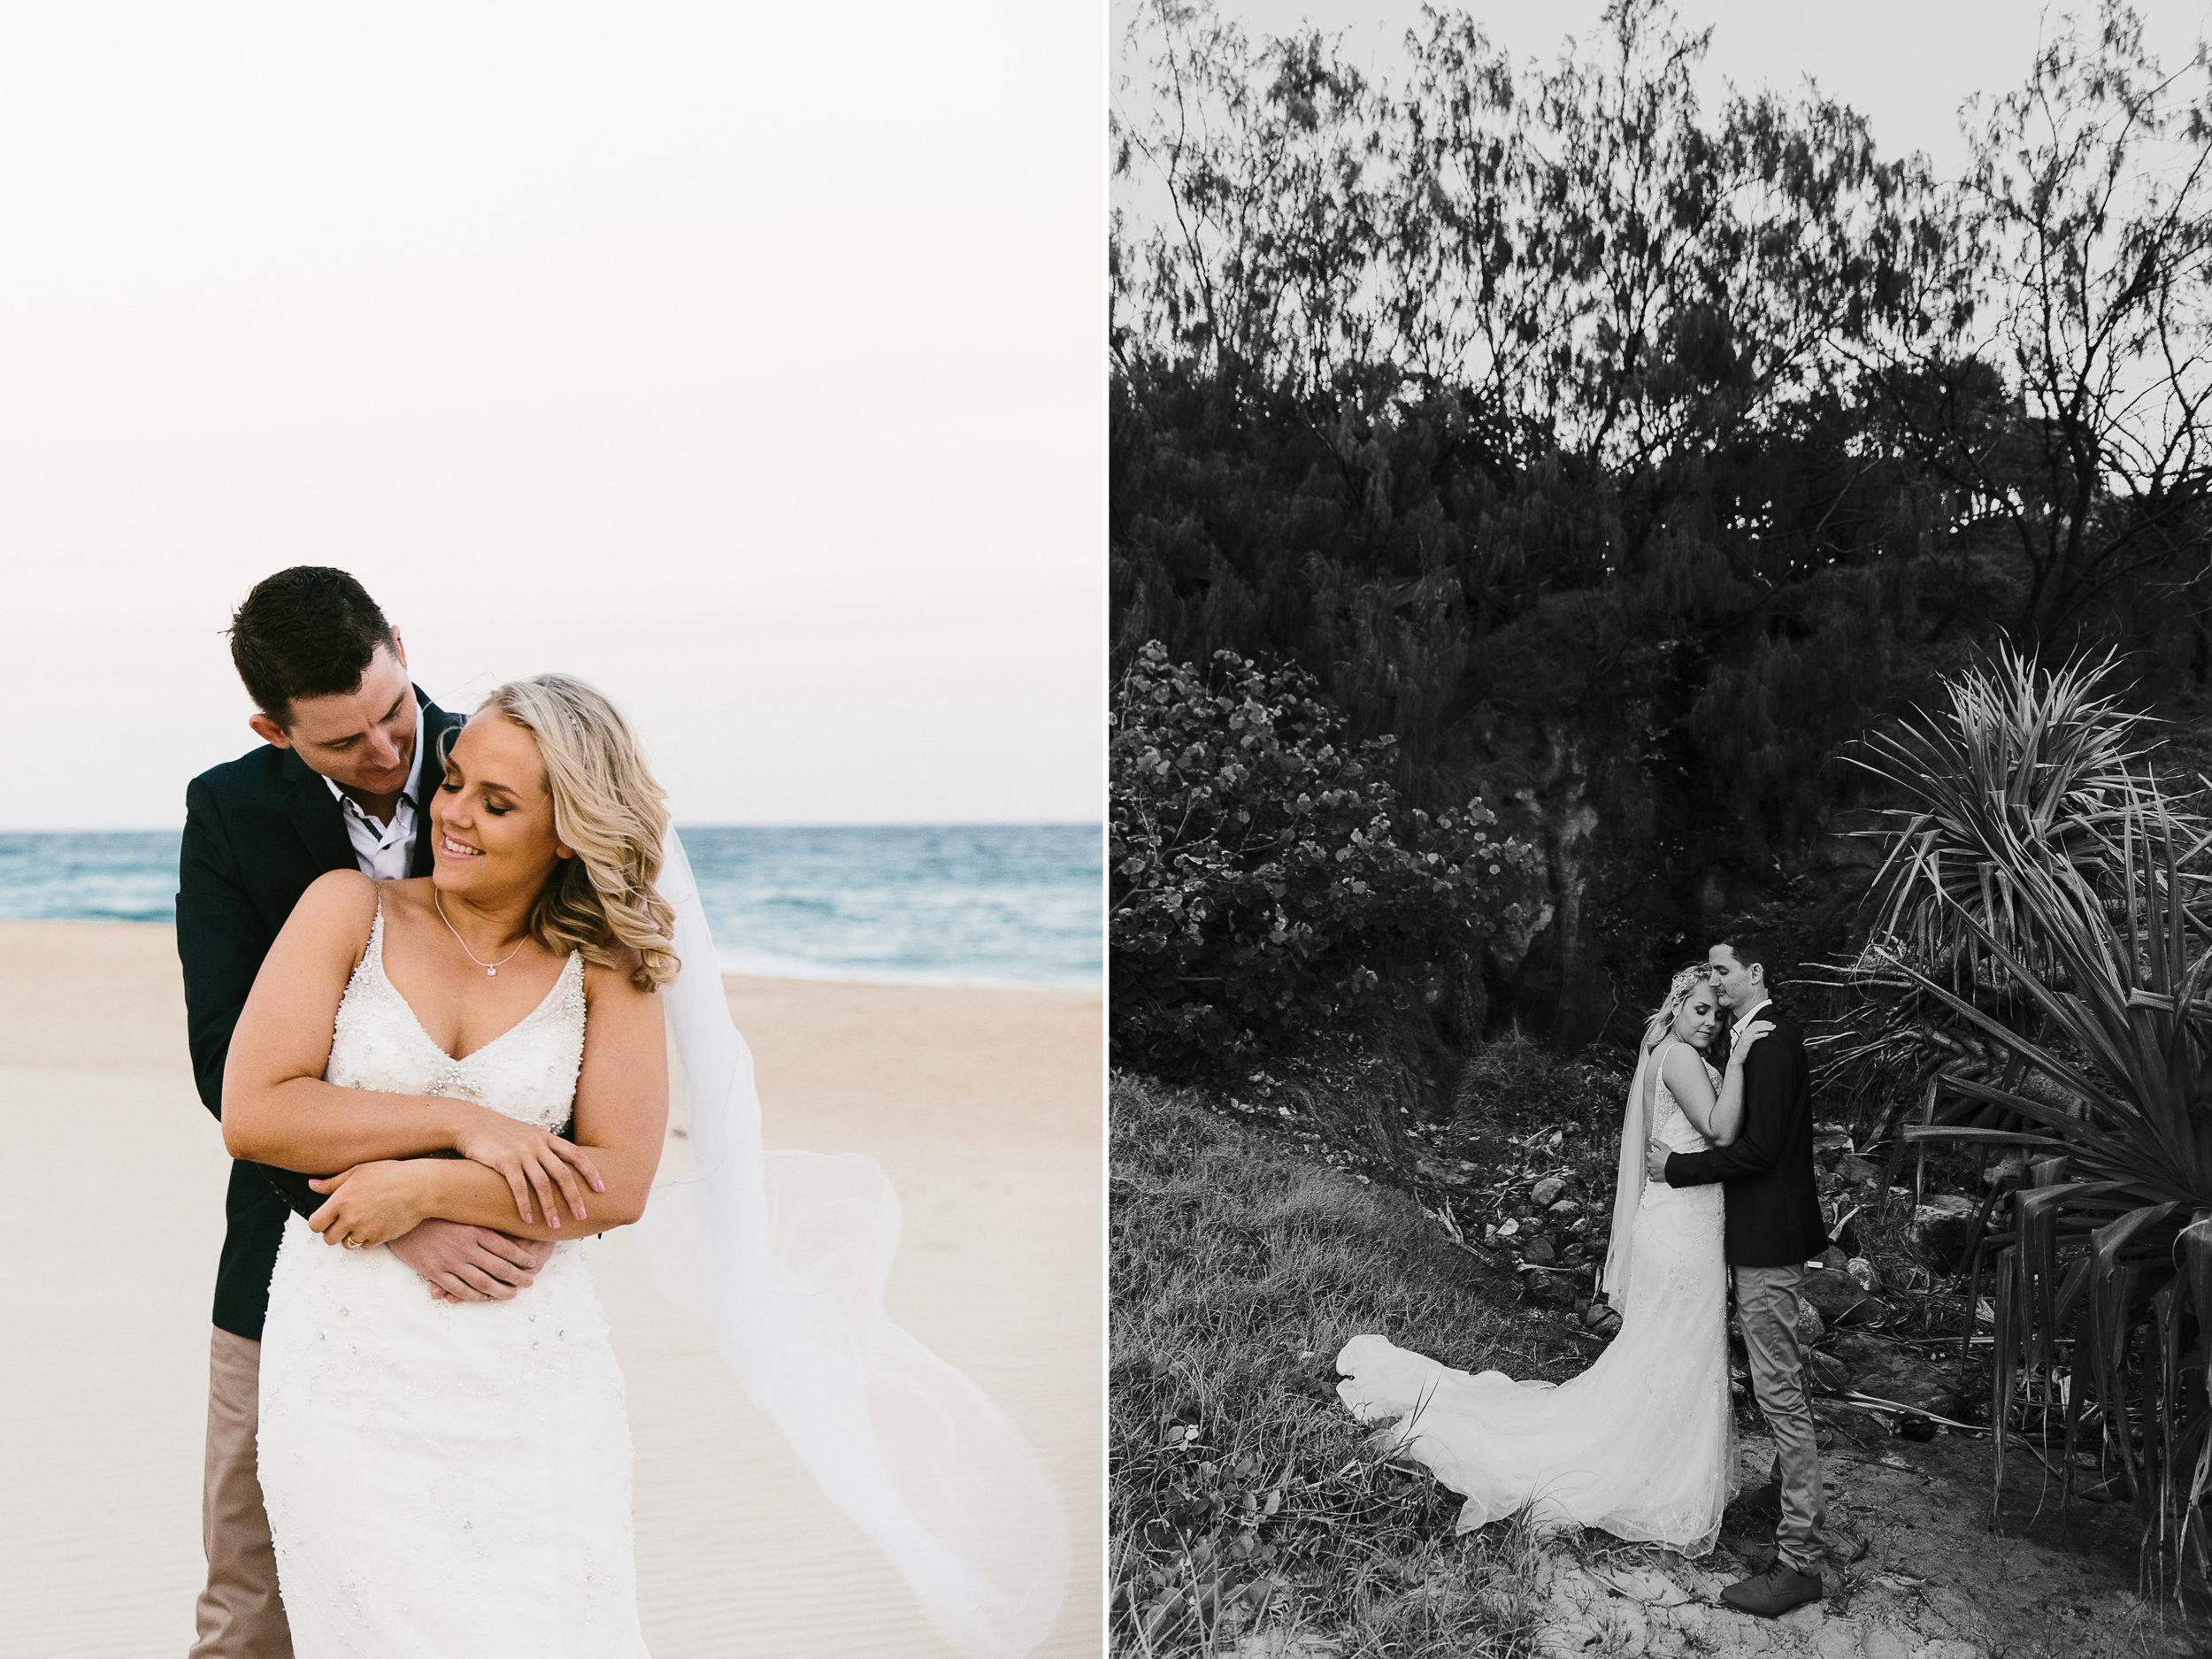 Queensland-Beach-Wedding-22.jpg